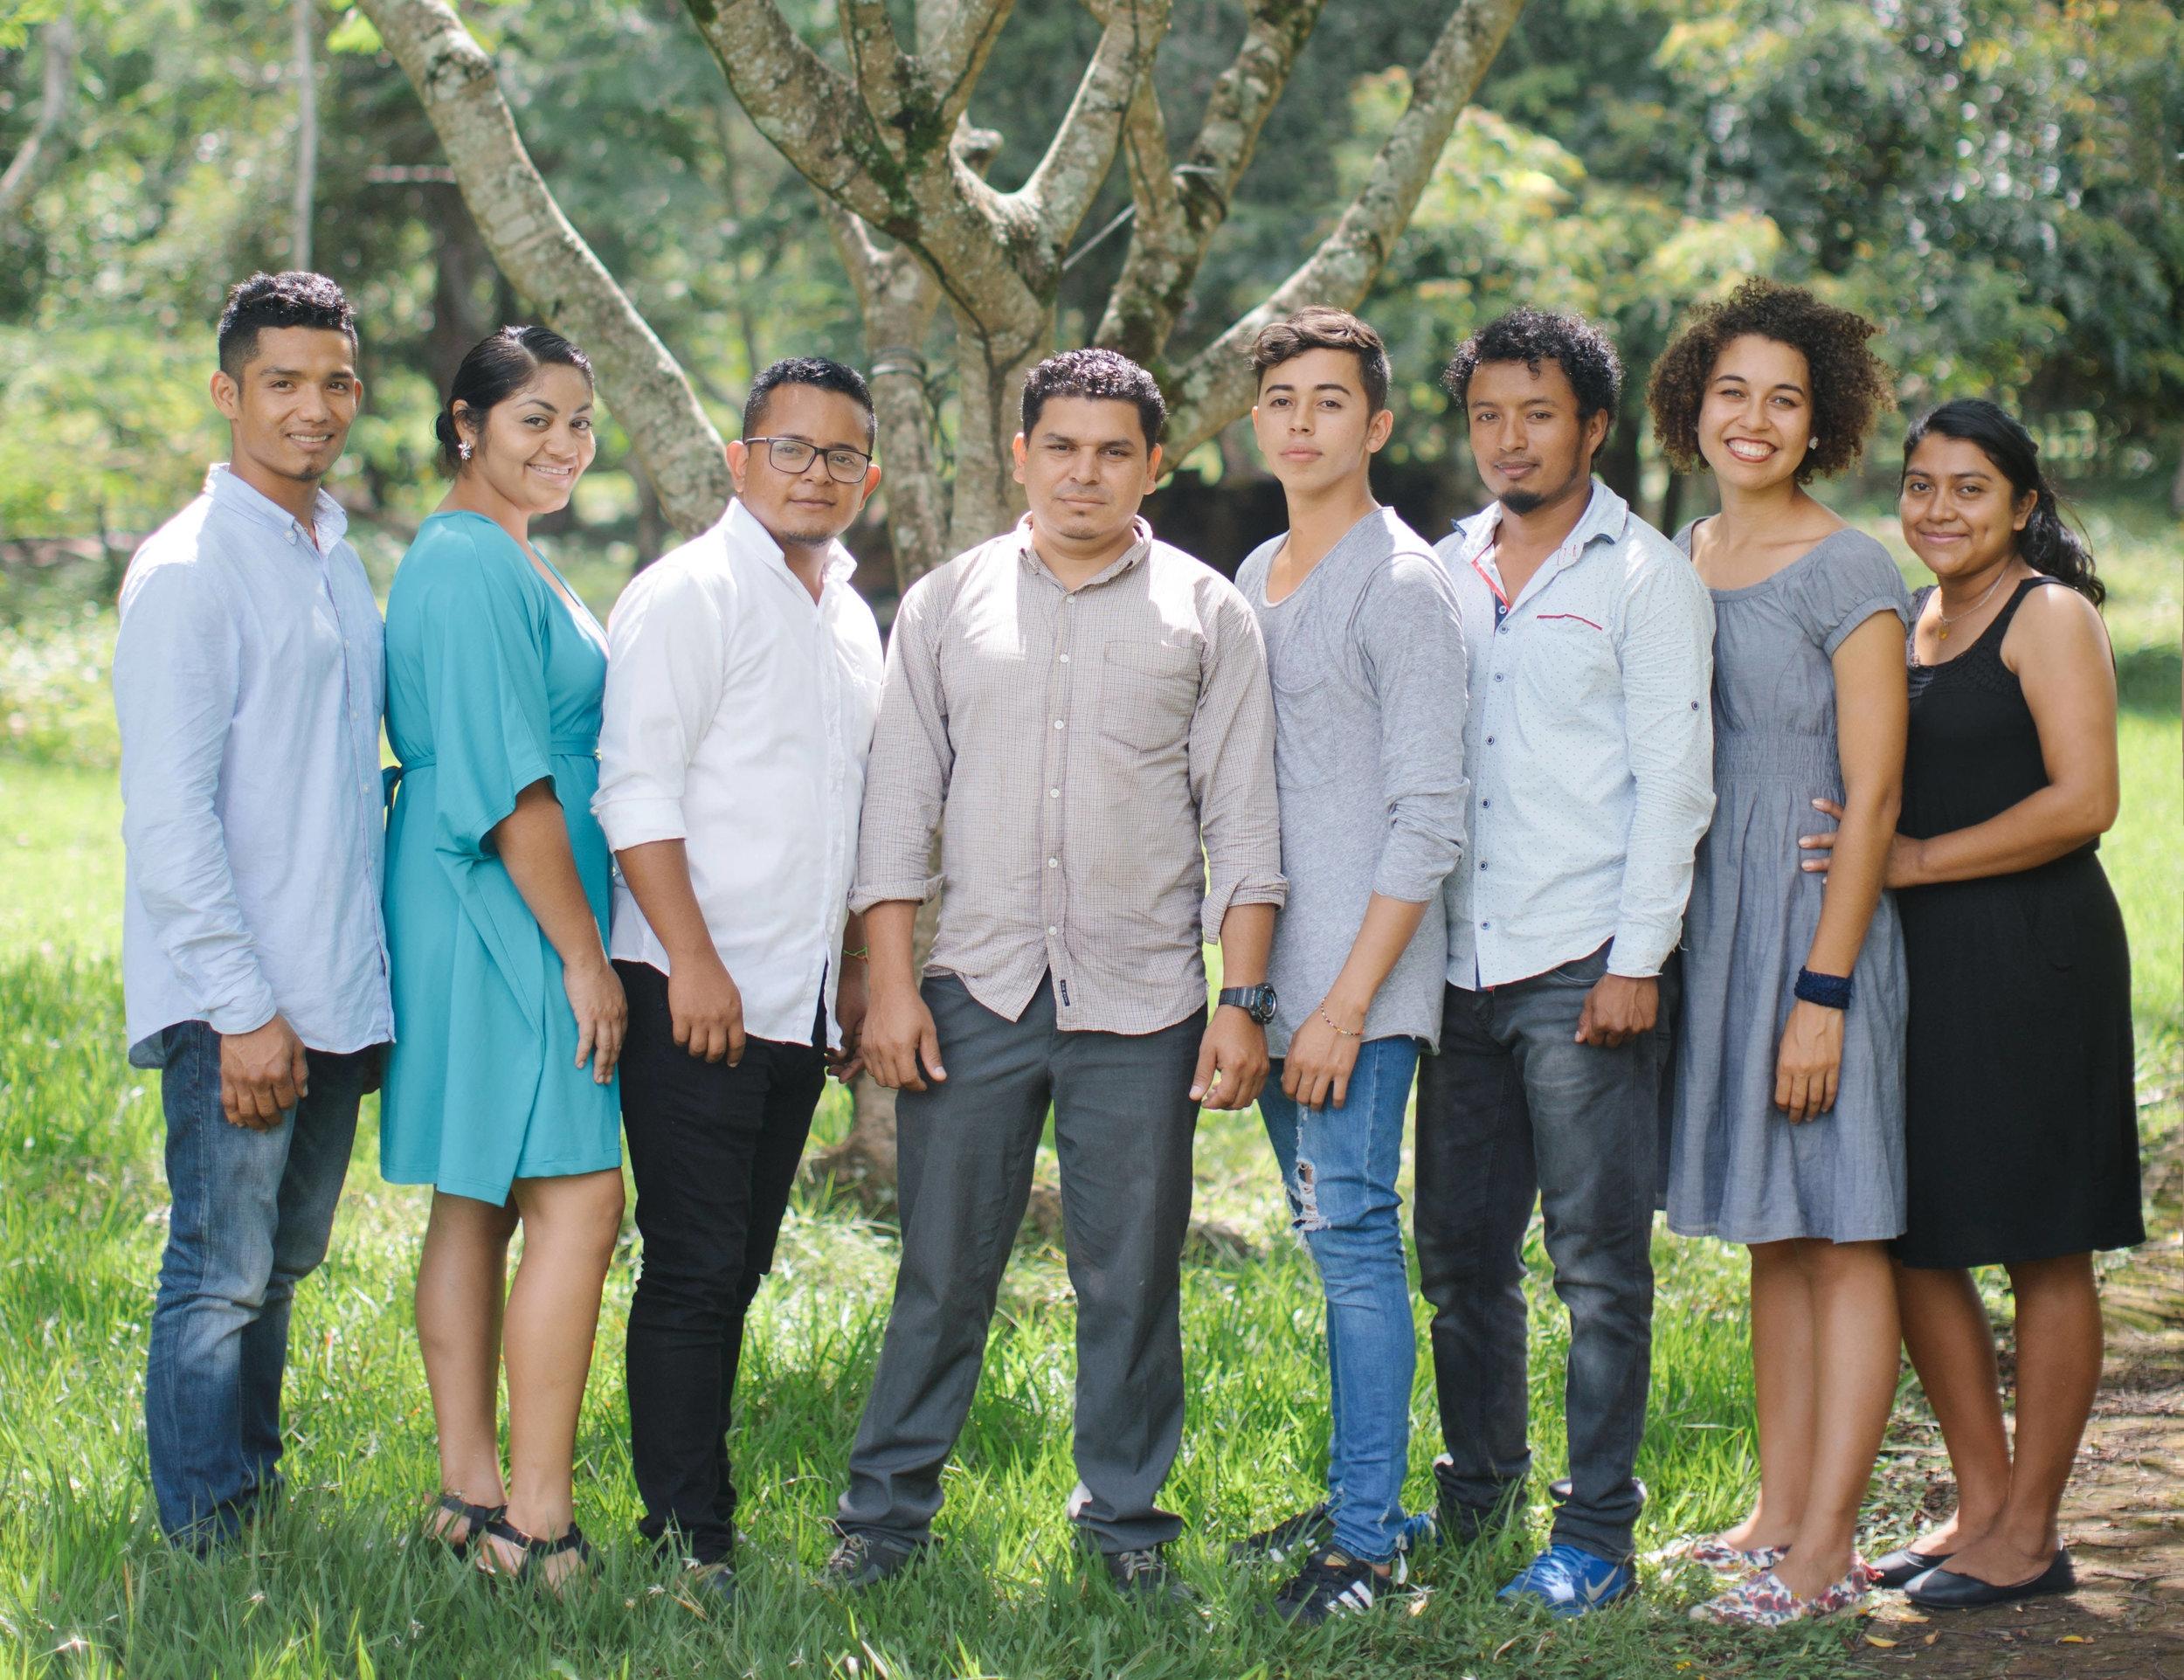 The Mercy Center Staff: Rolando, Nintzy, Abelito, Walter, Amilkar, William, Ellen, and Fany!